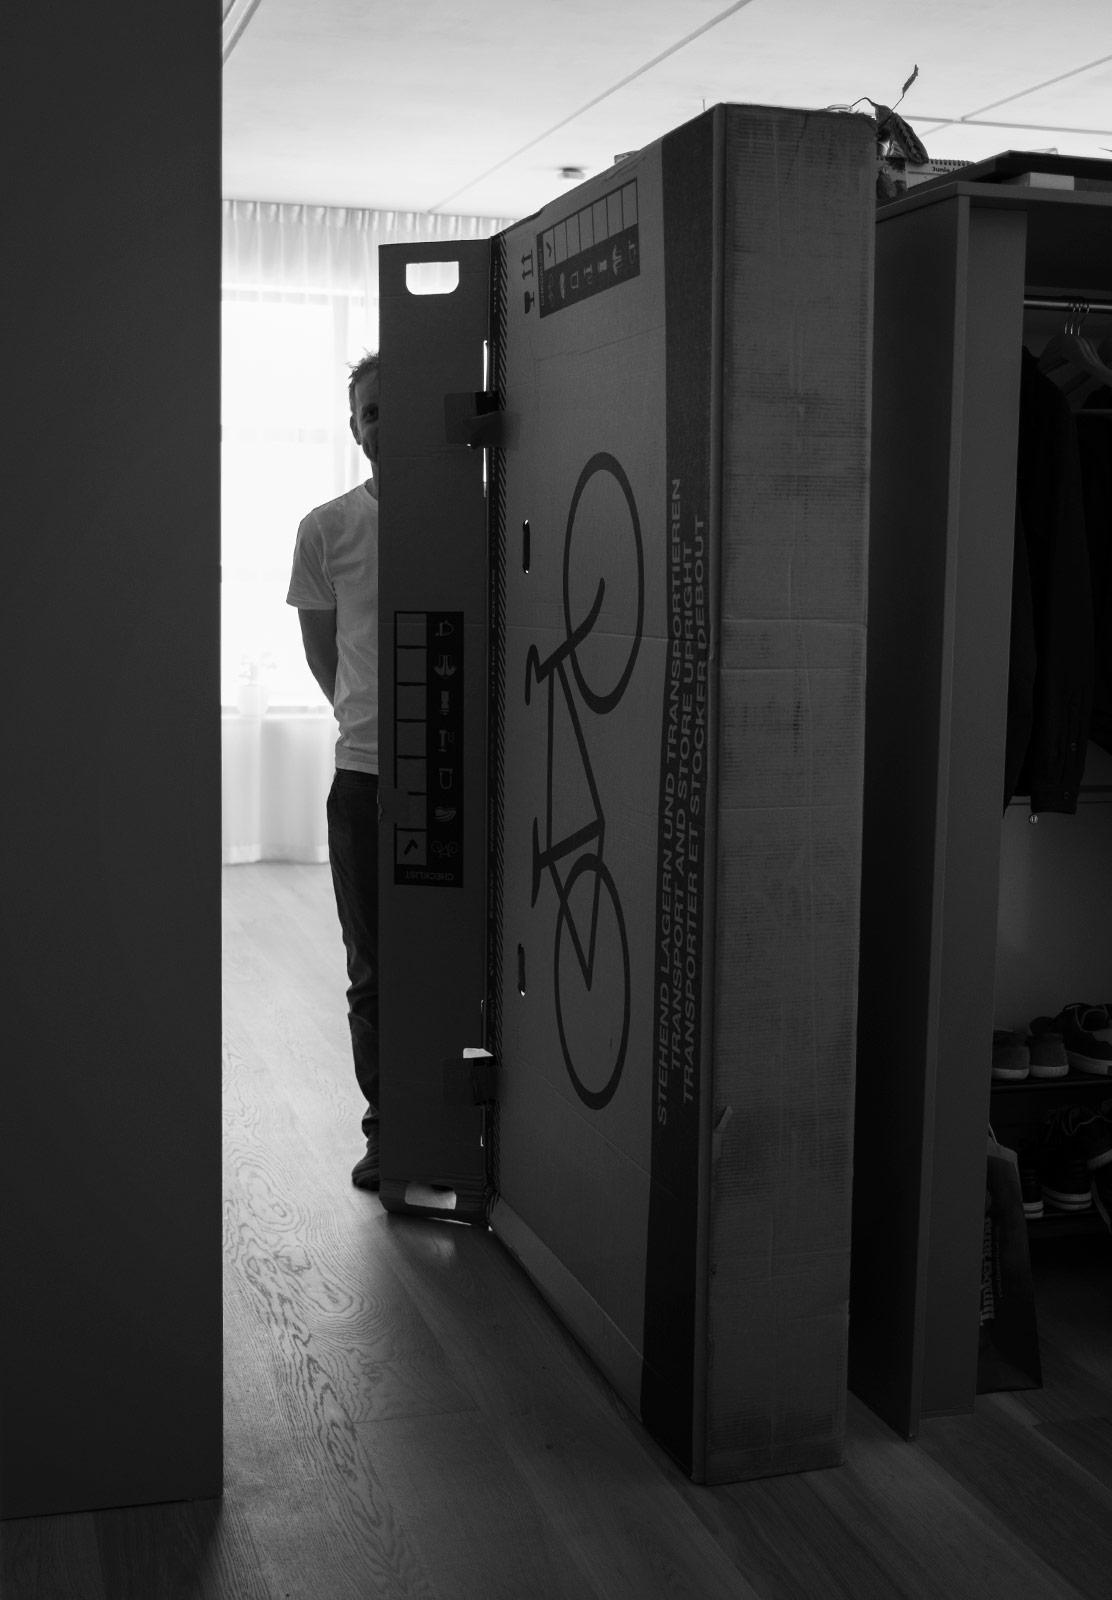 Man standing next to tall box